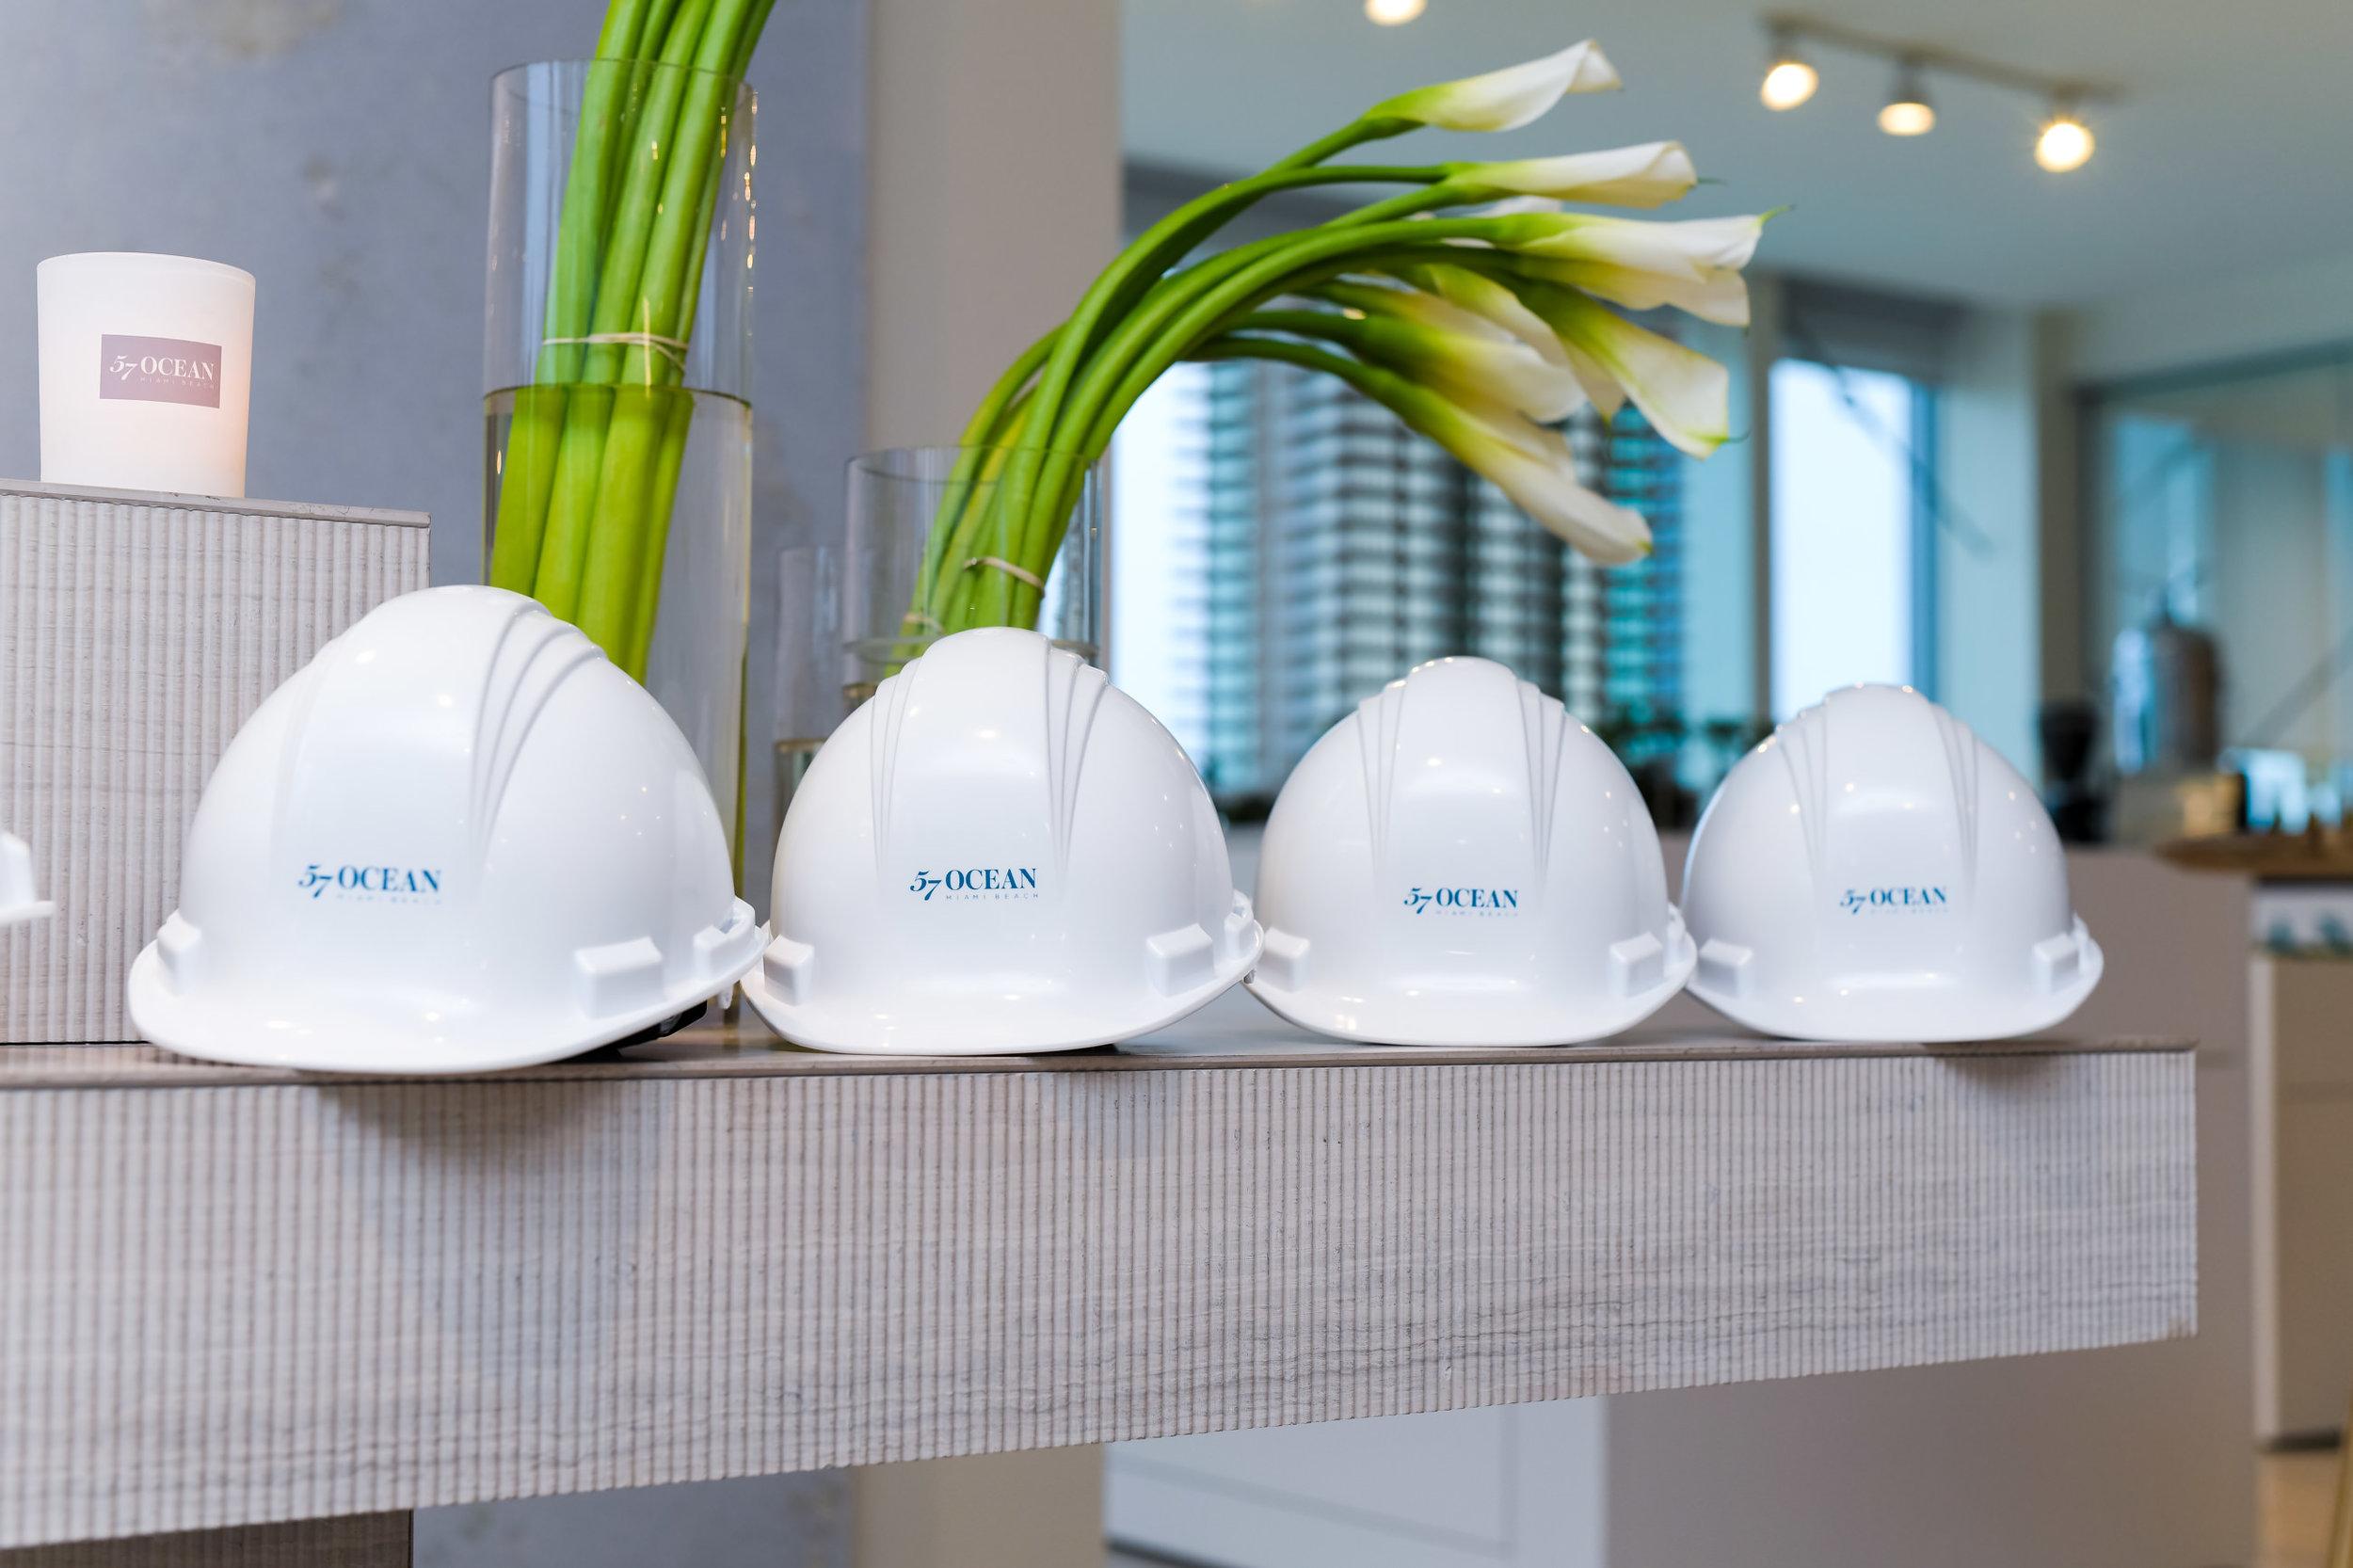 Multiplan Real Estate Asset Management Breaks Ground On 57 Ocean In Miami Beach